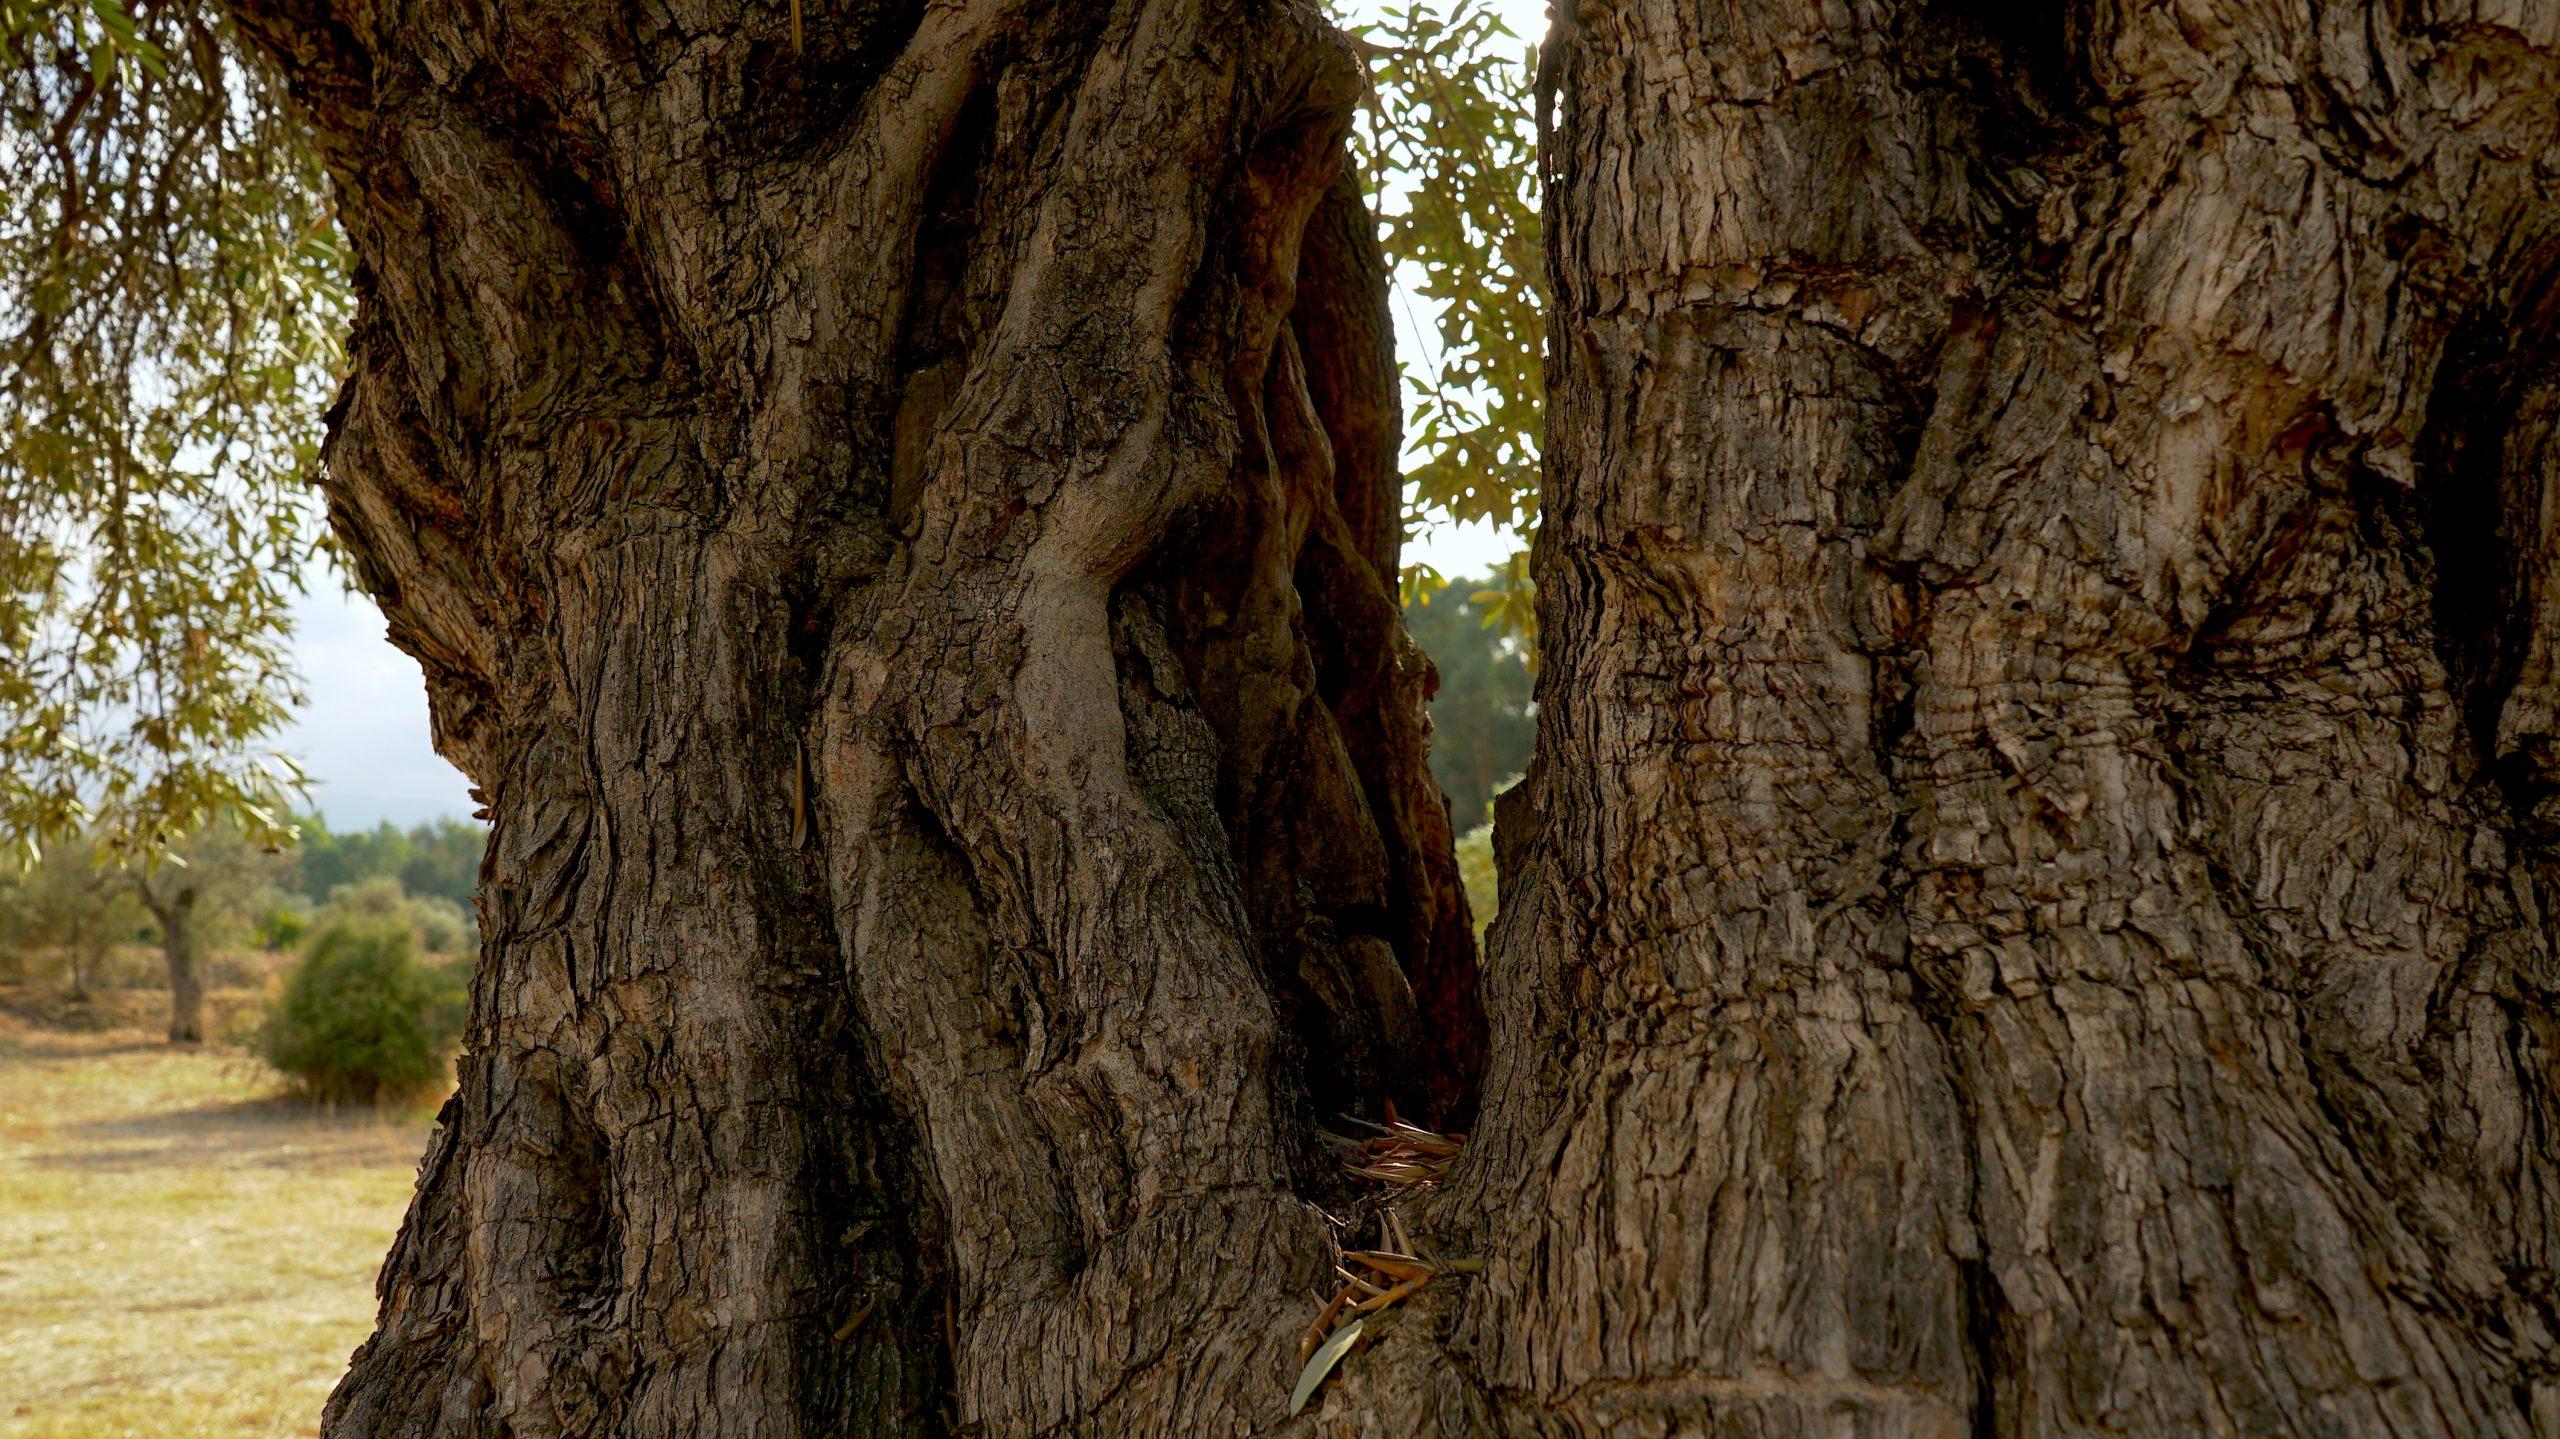 Olive Carbon / Ecosystem Services © Nicolas Netien